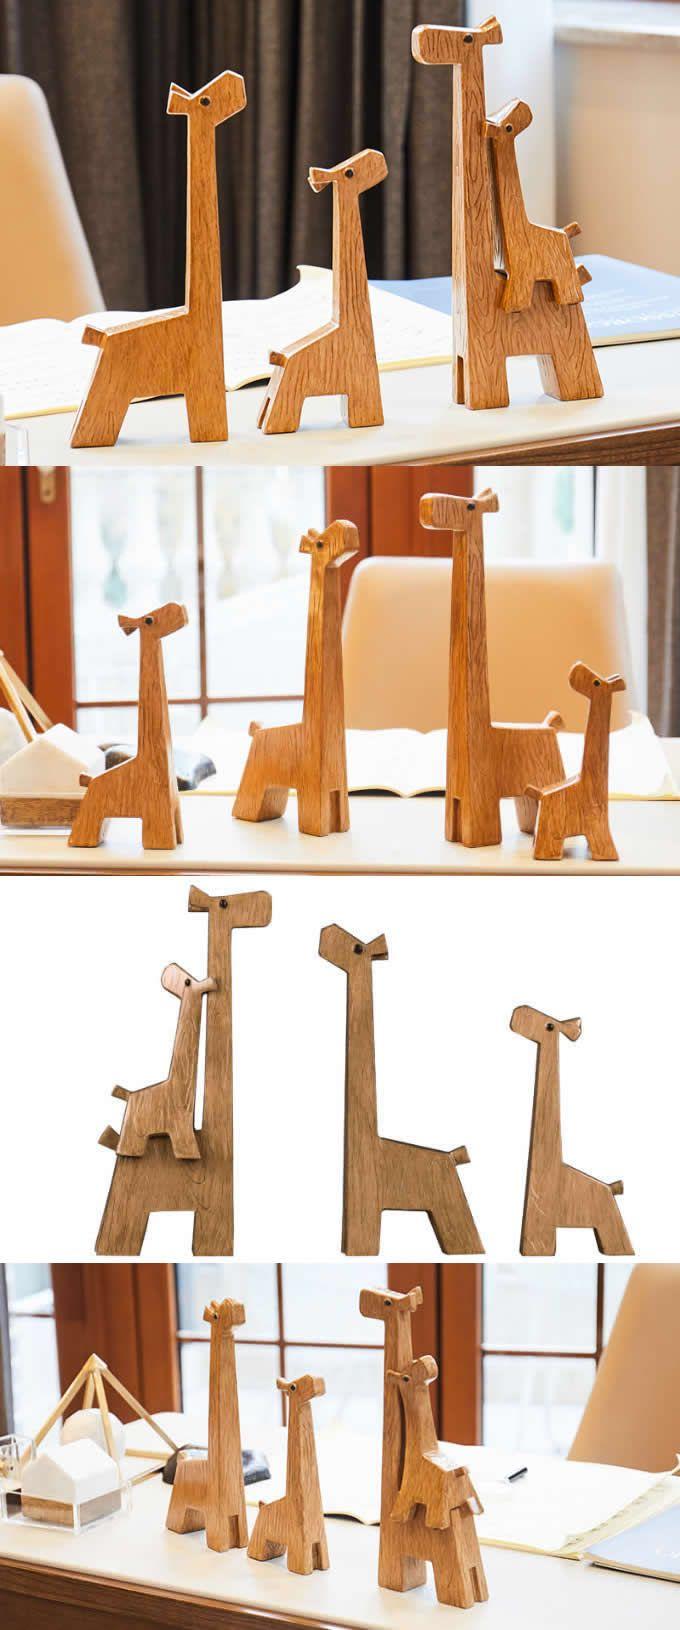 Simple Original Modern Wooden Animal Desktop Ornaments Handmade Wood Giraffe Figurine New Creative Home Decorations